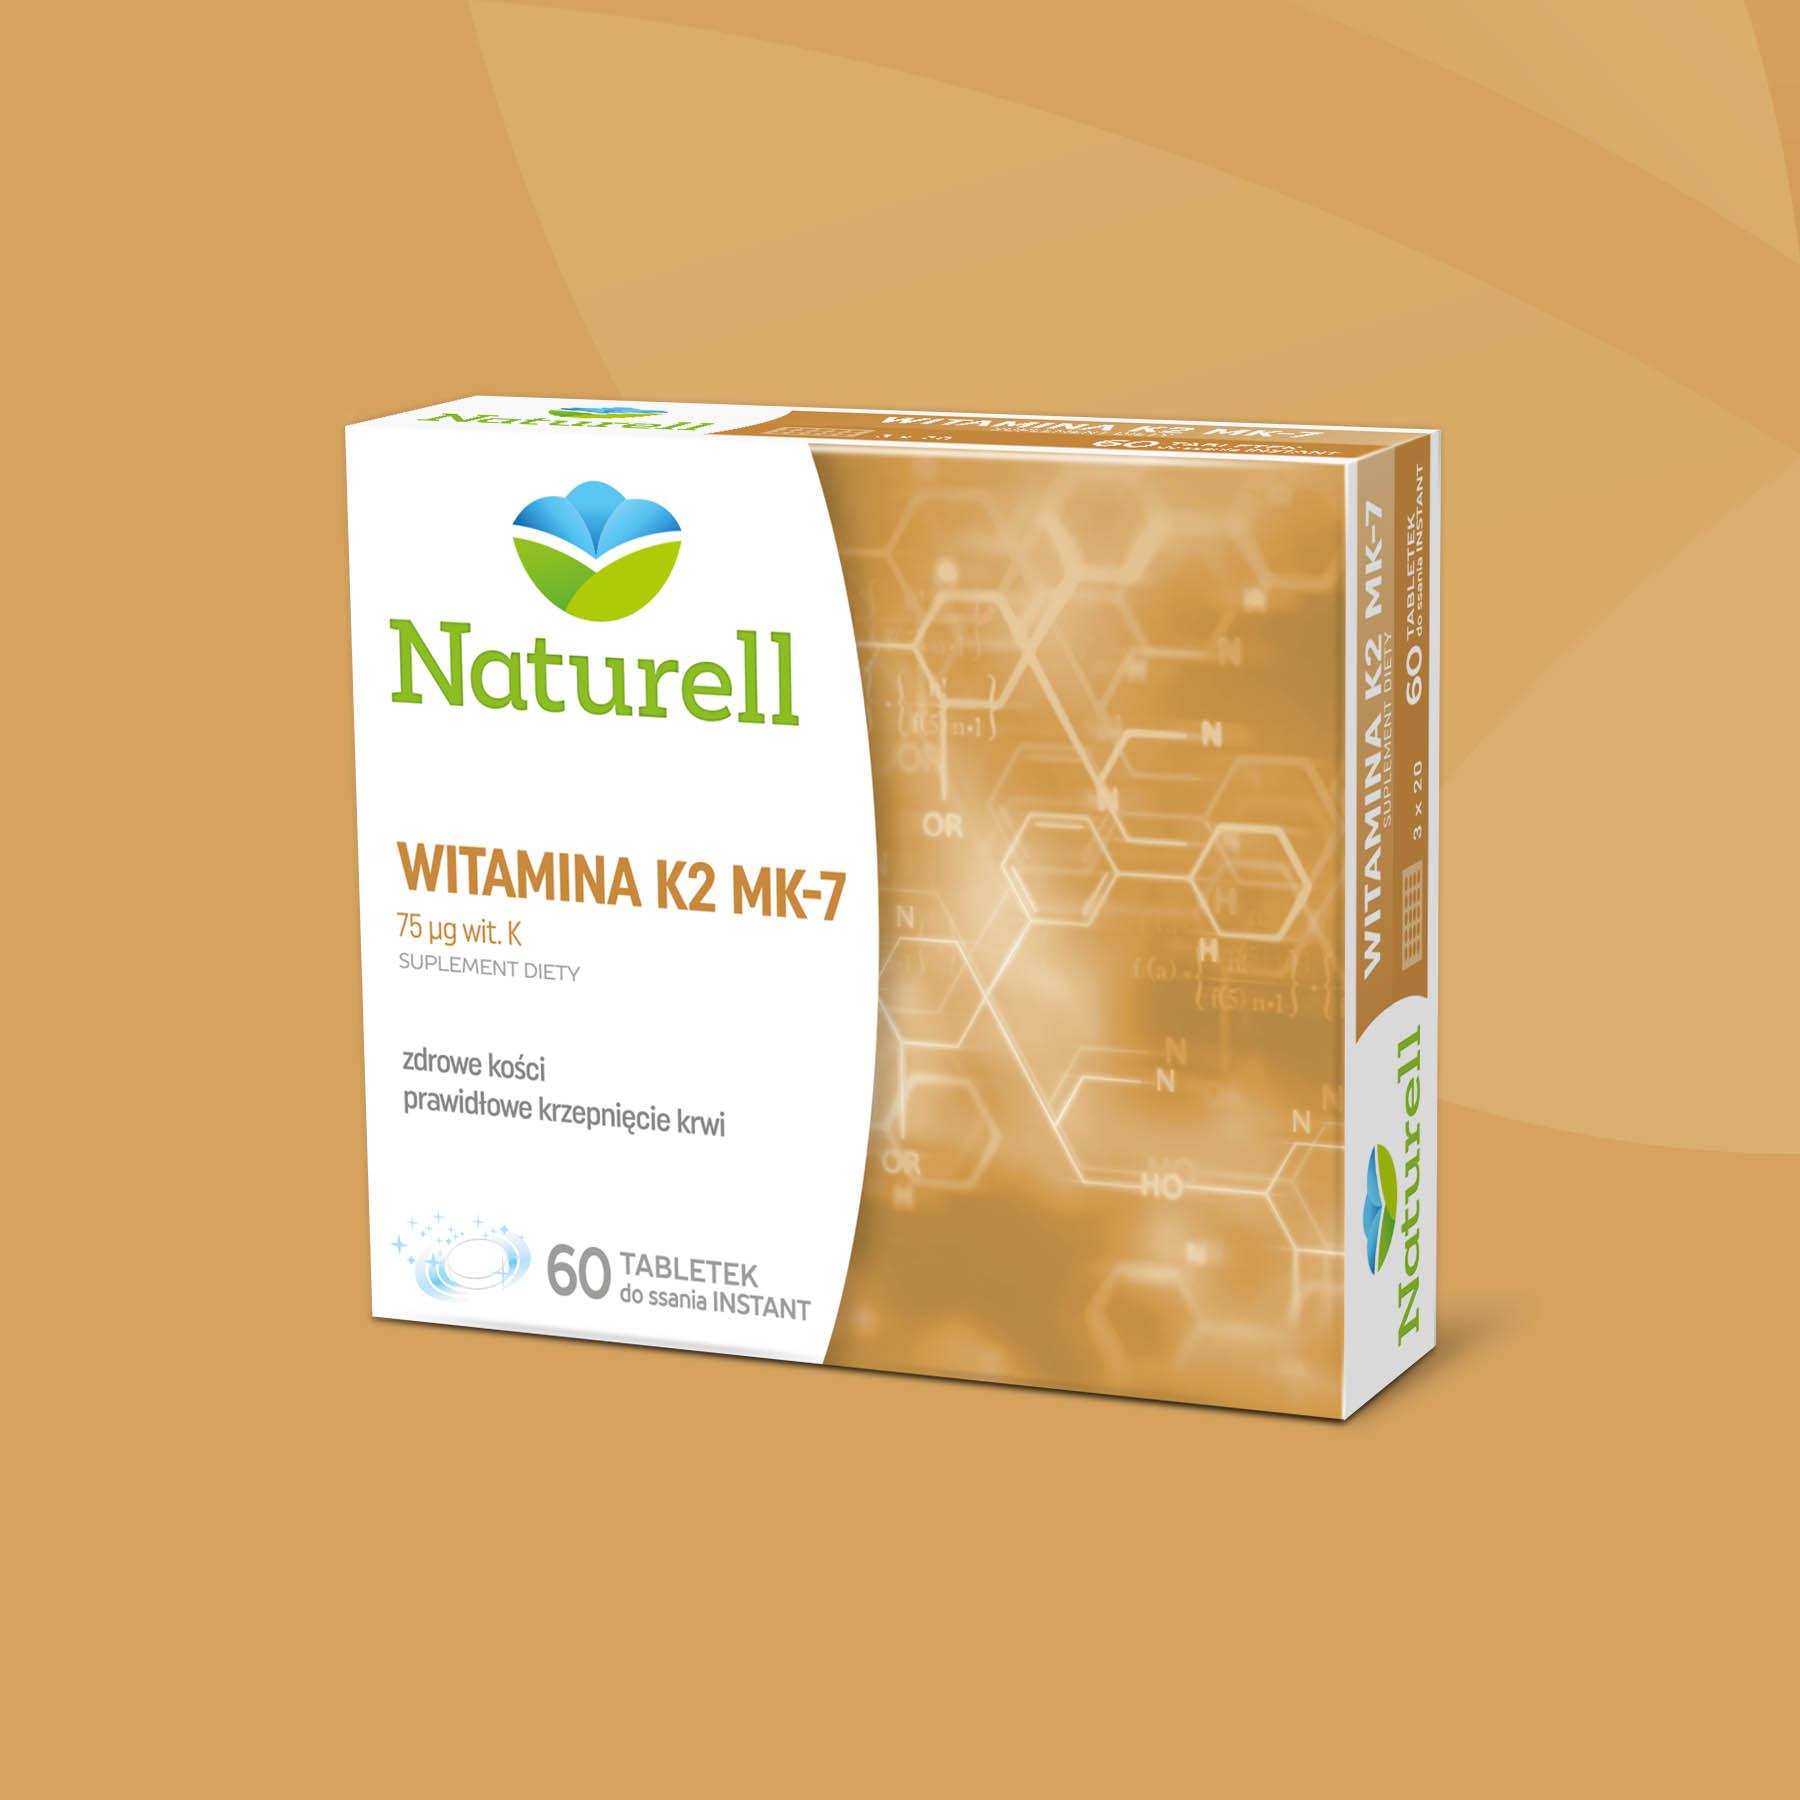 Naturell Vitamin K2 Package Design